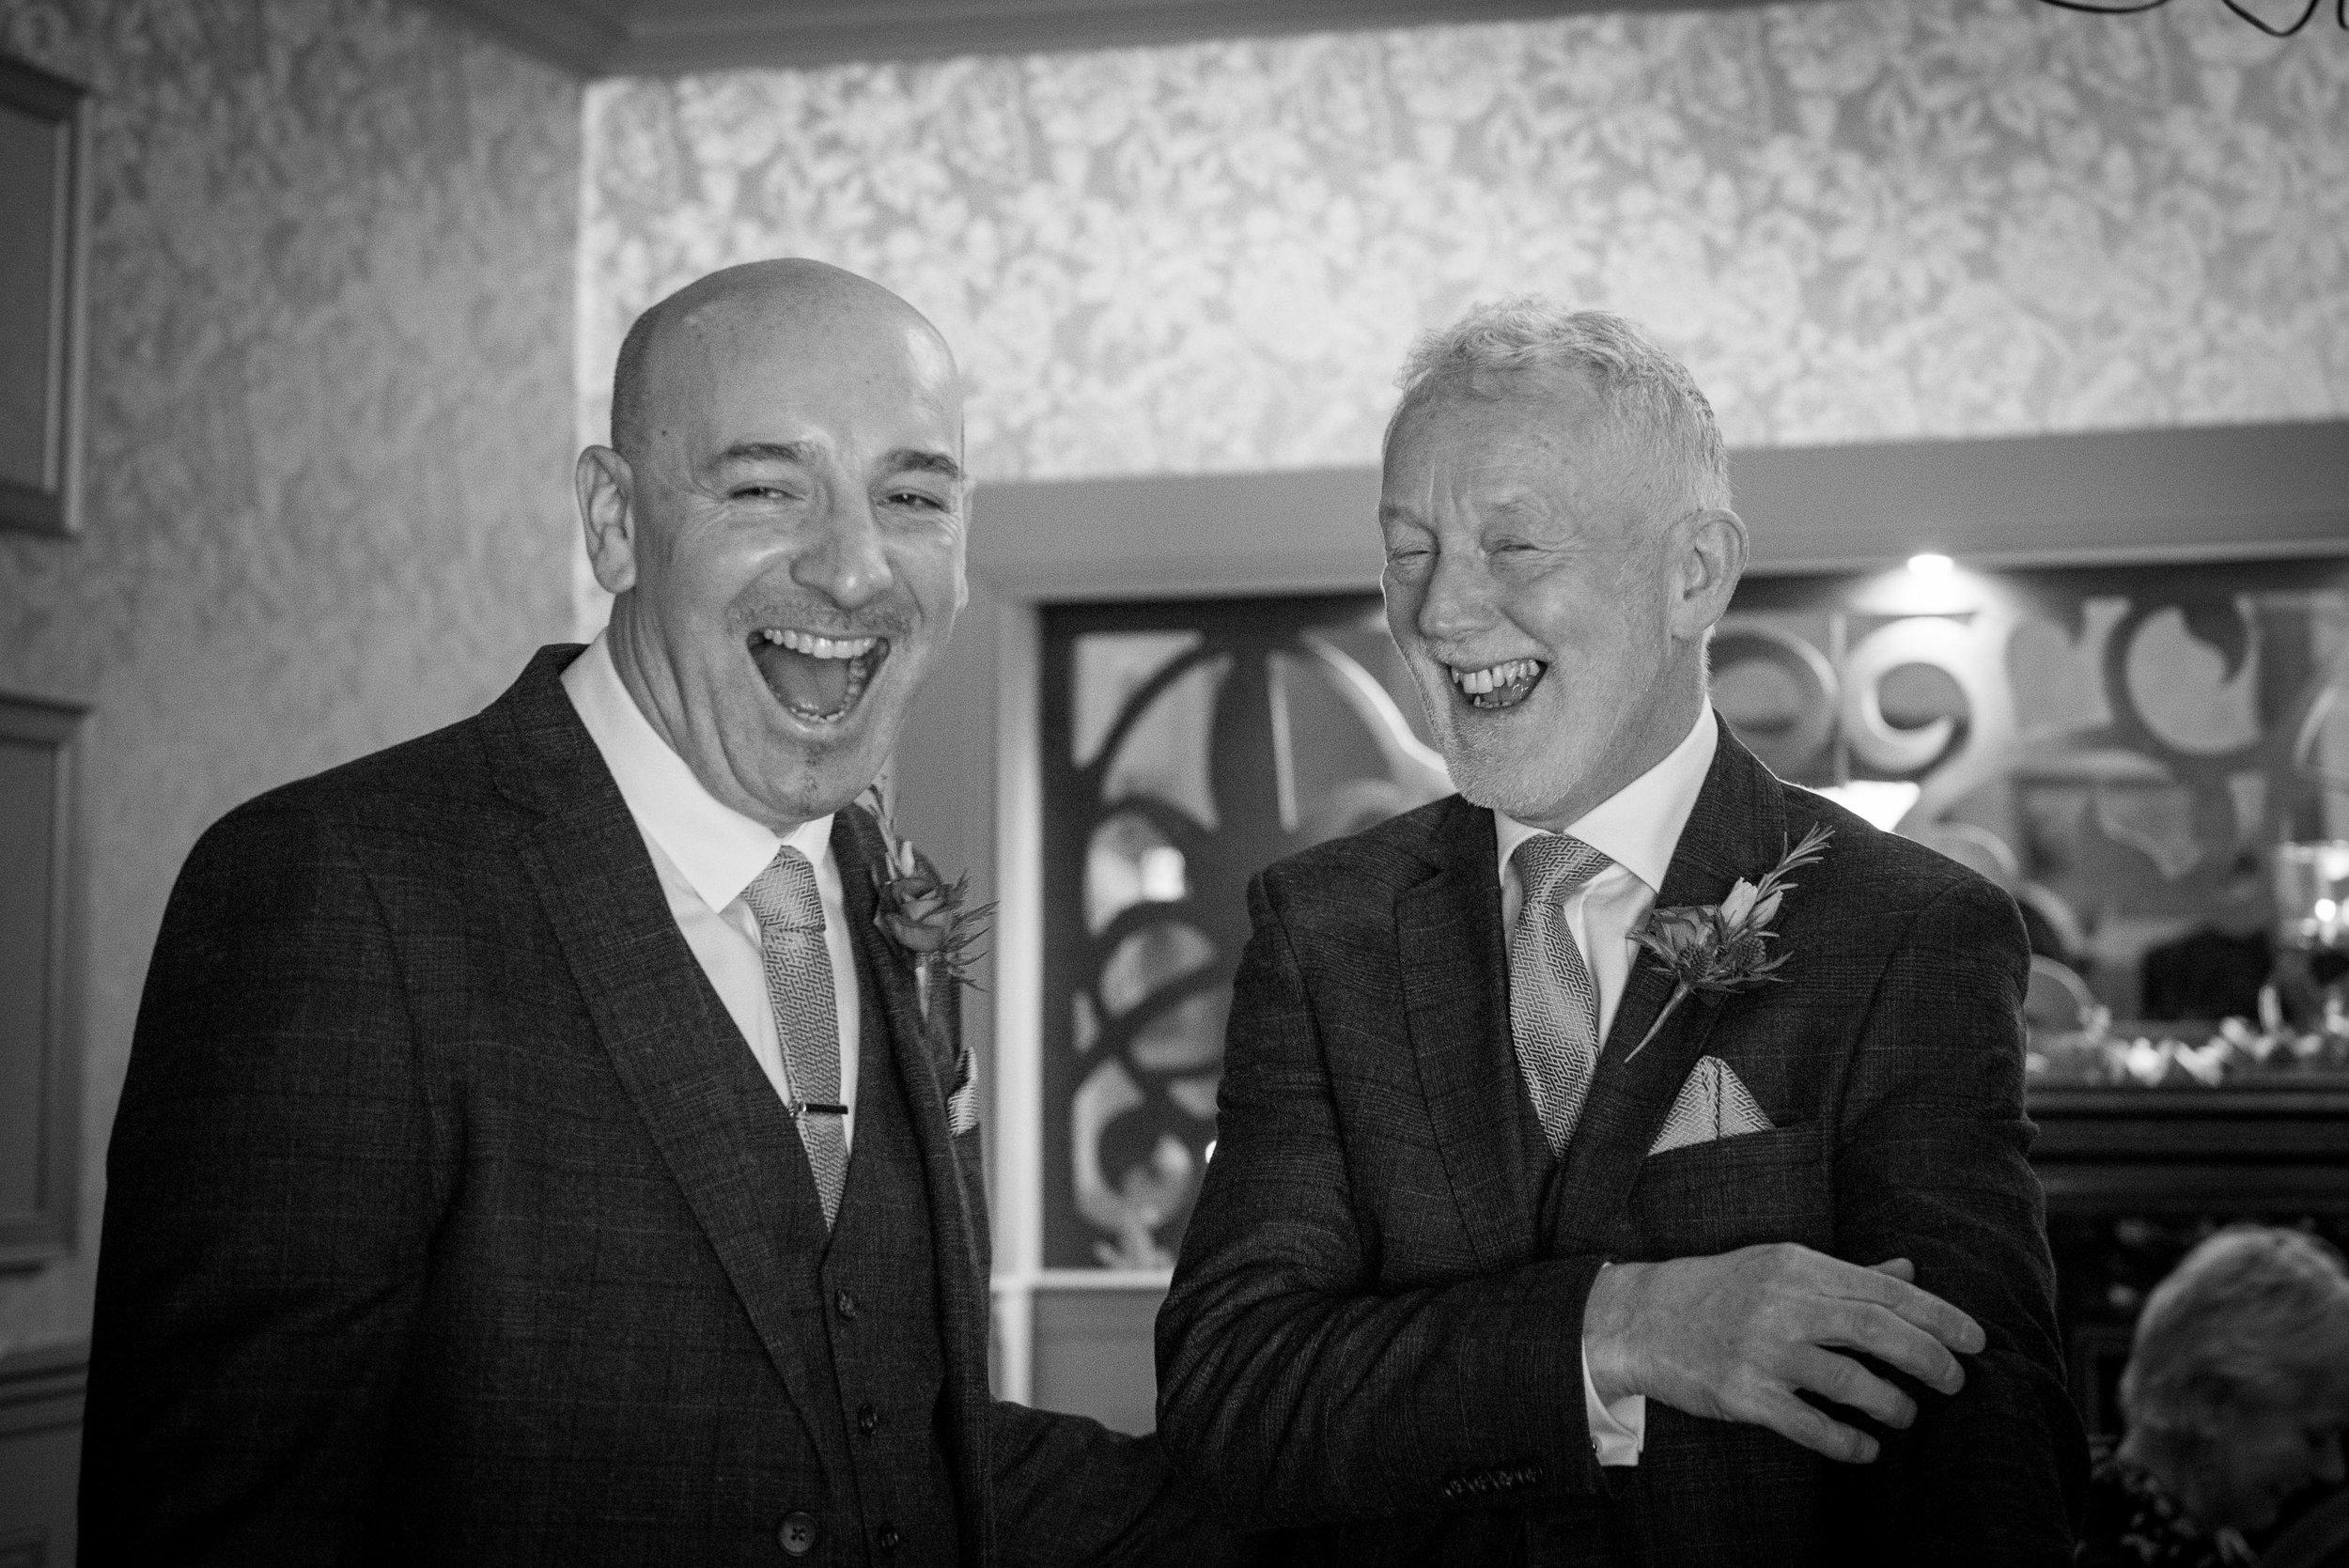 wedding-0guests-at-grassington-house.jpg